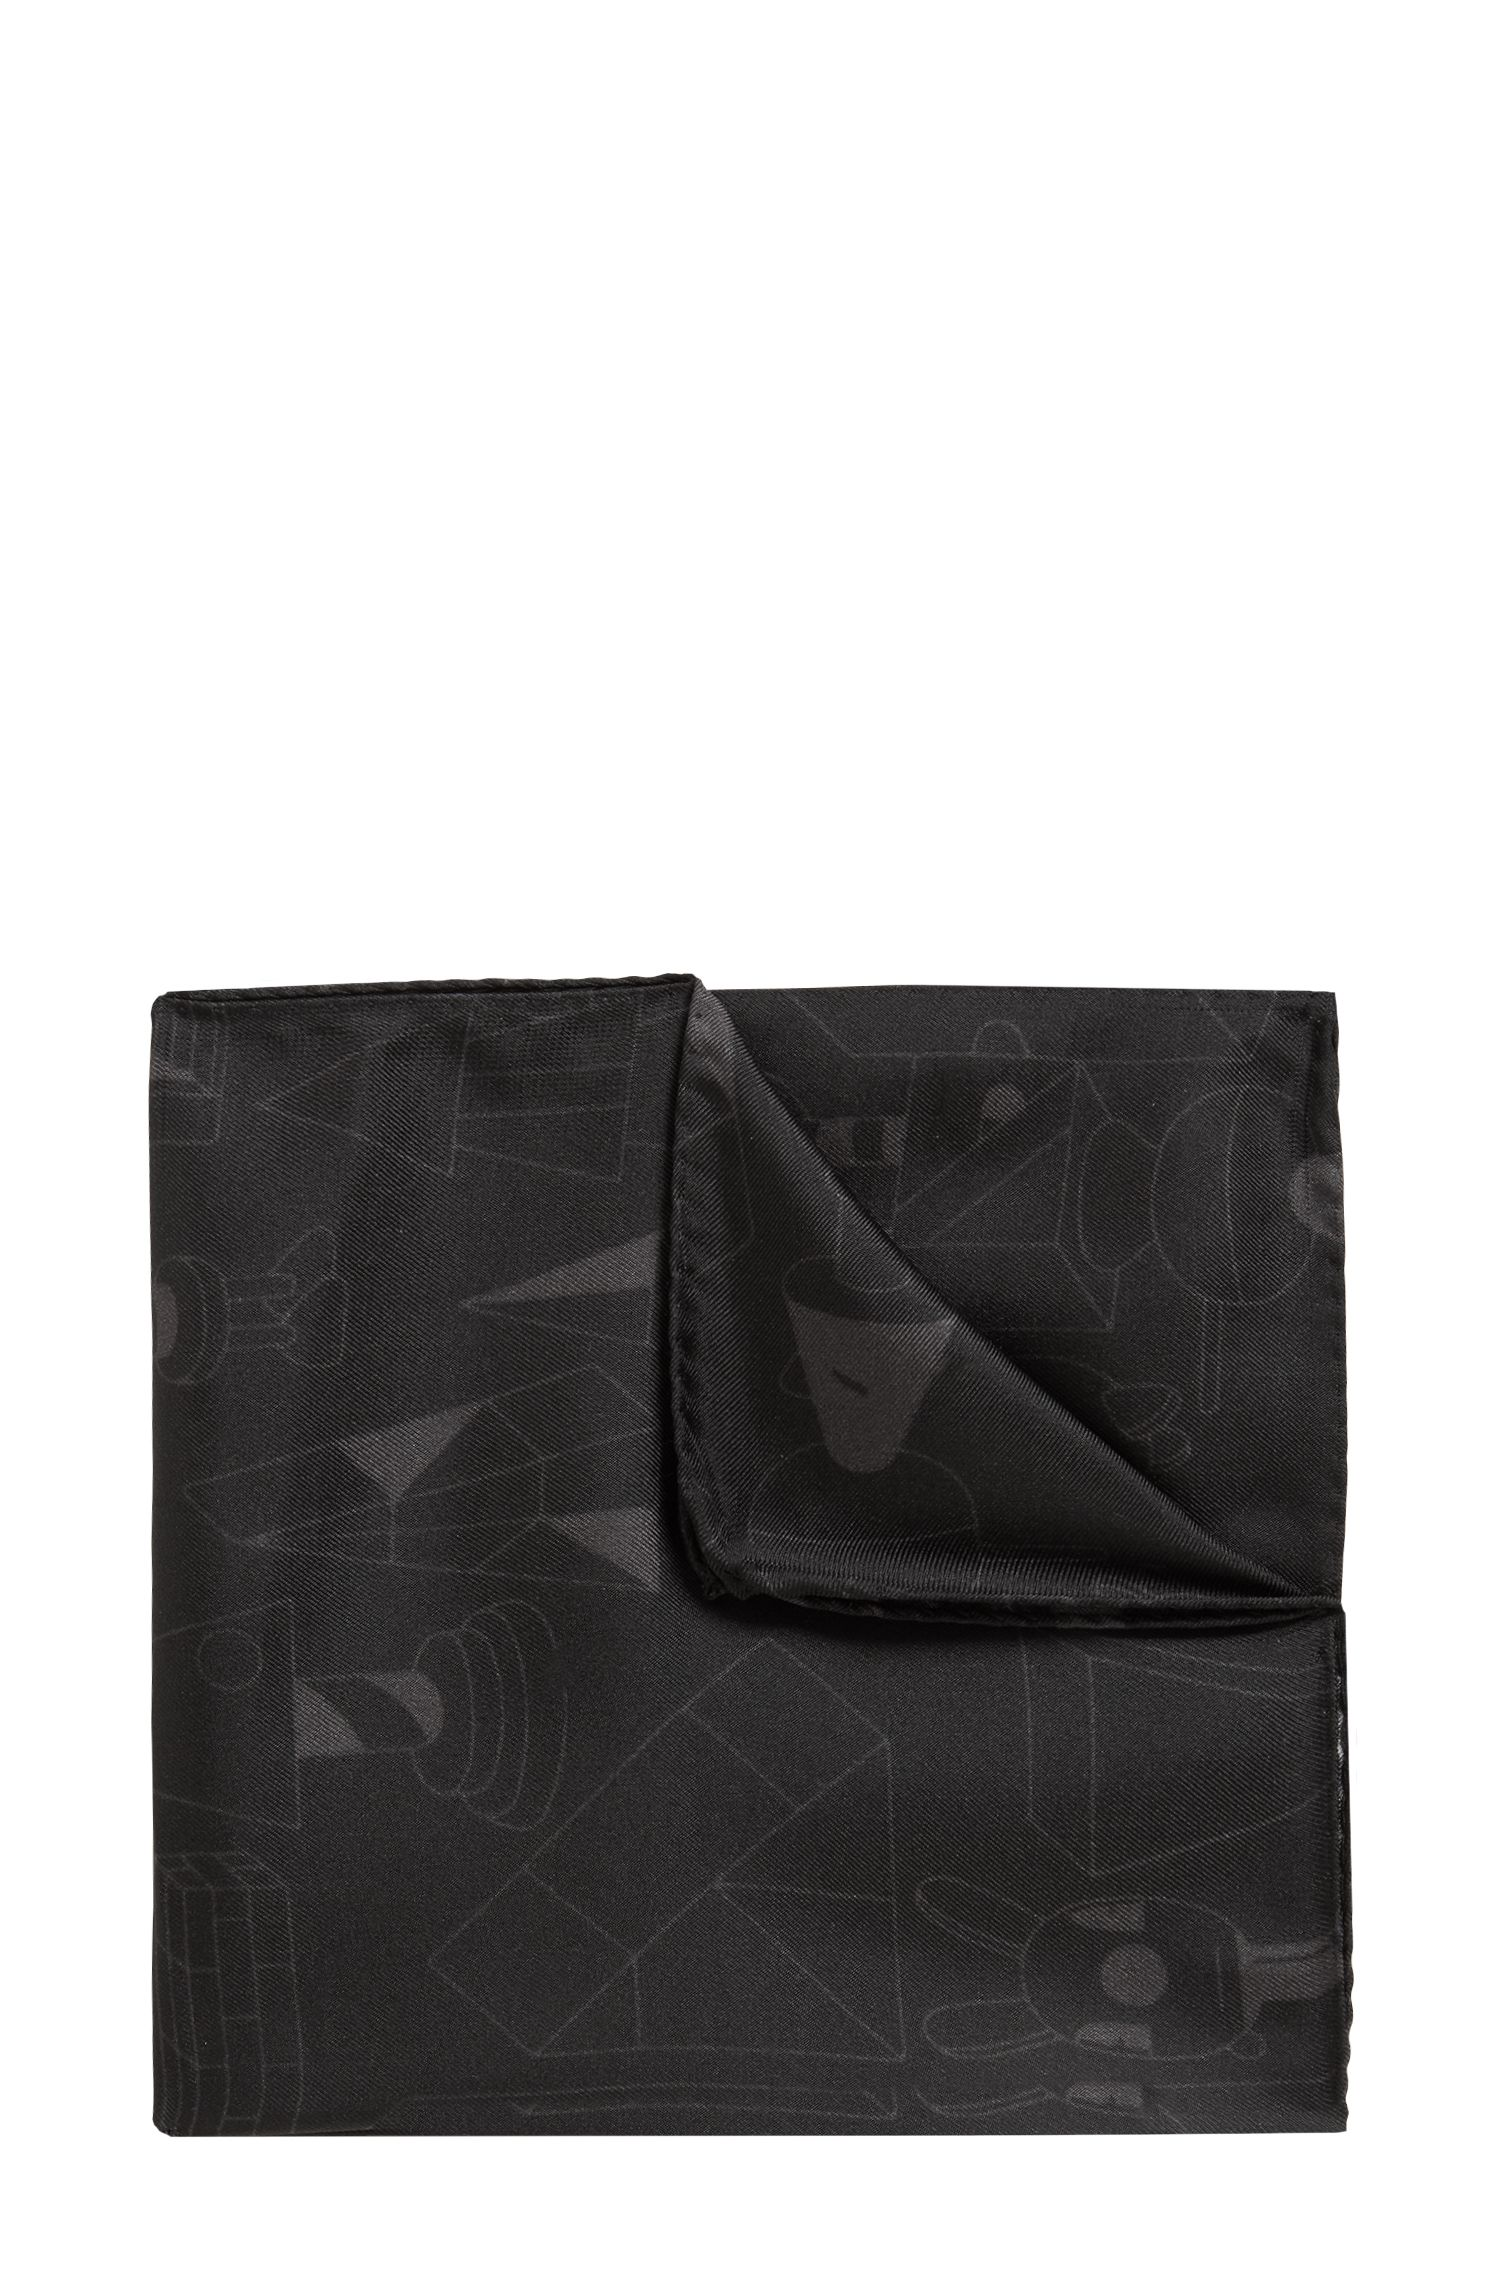 Limited-edition silk pocket square with Jeremyville design, Black